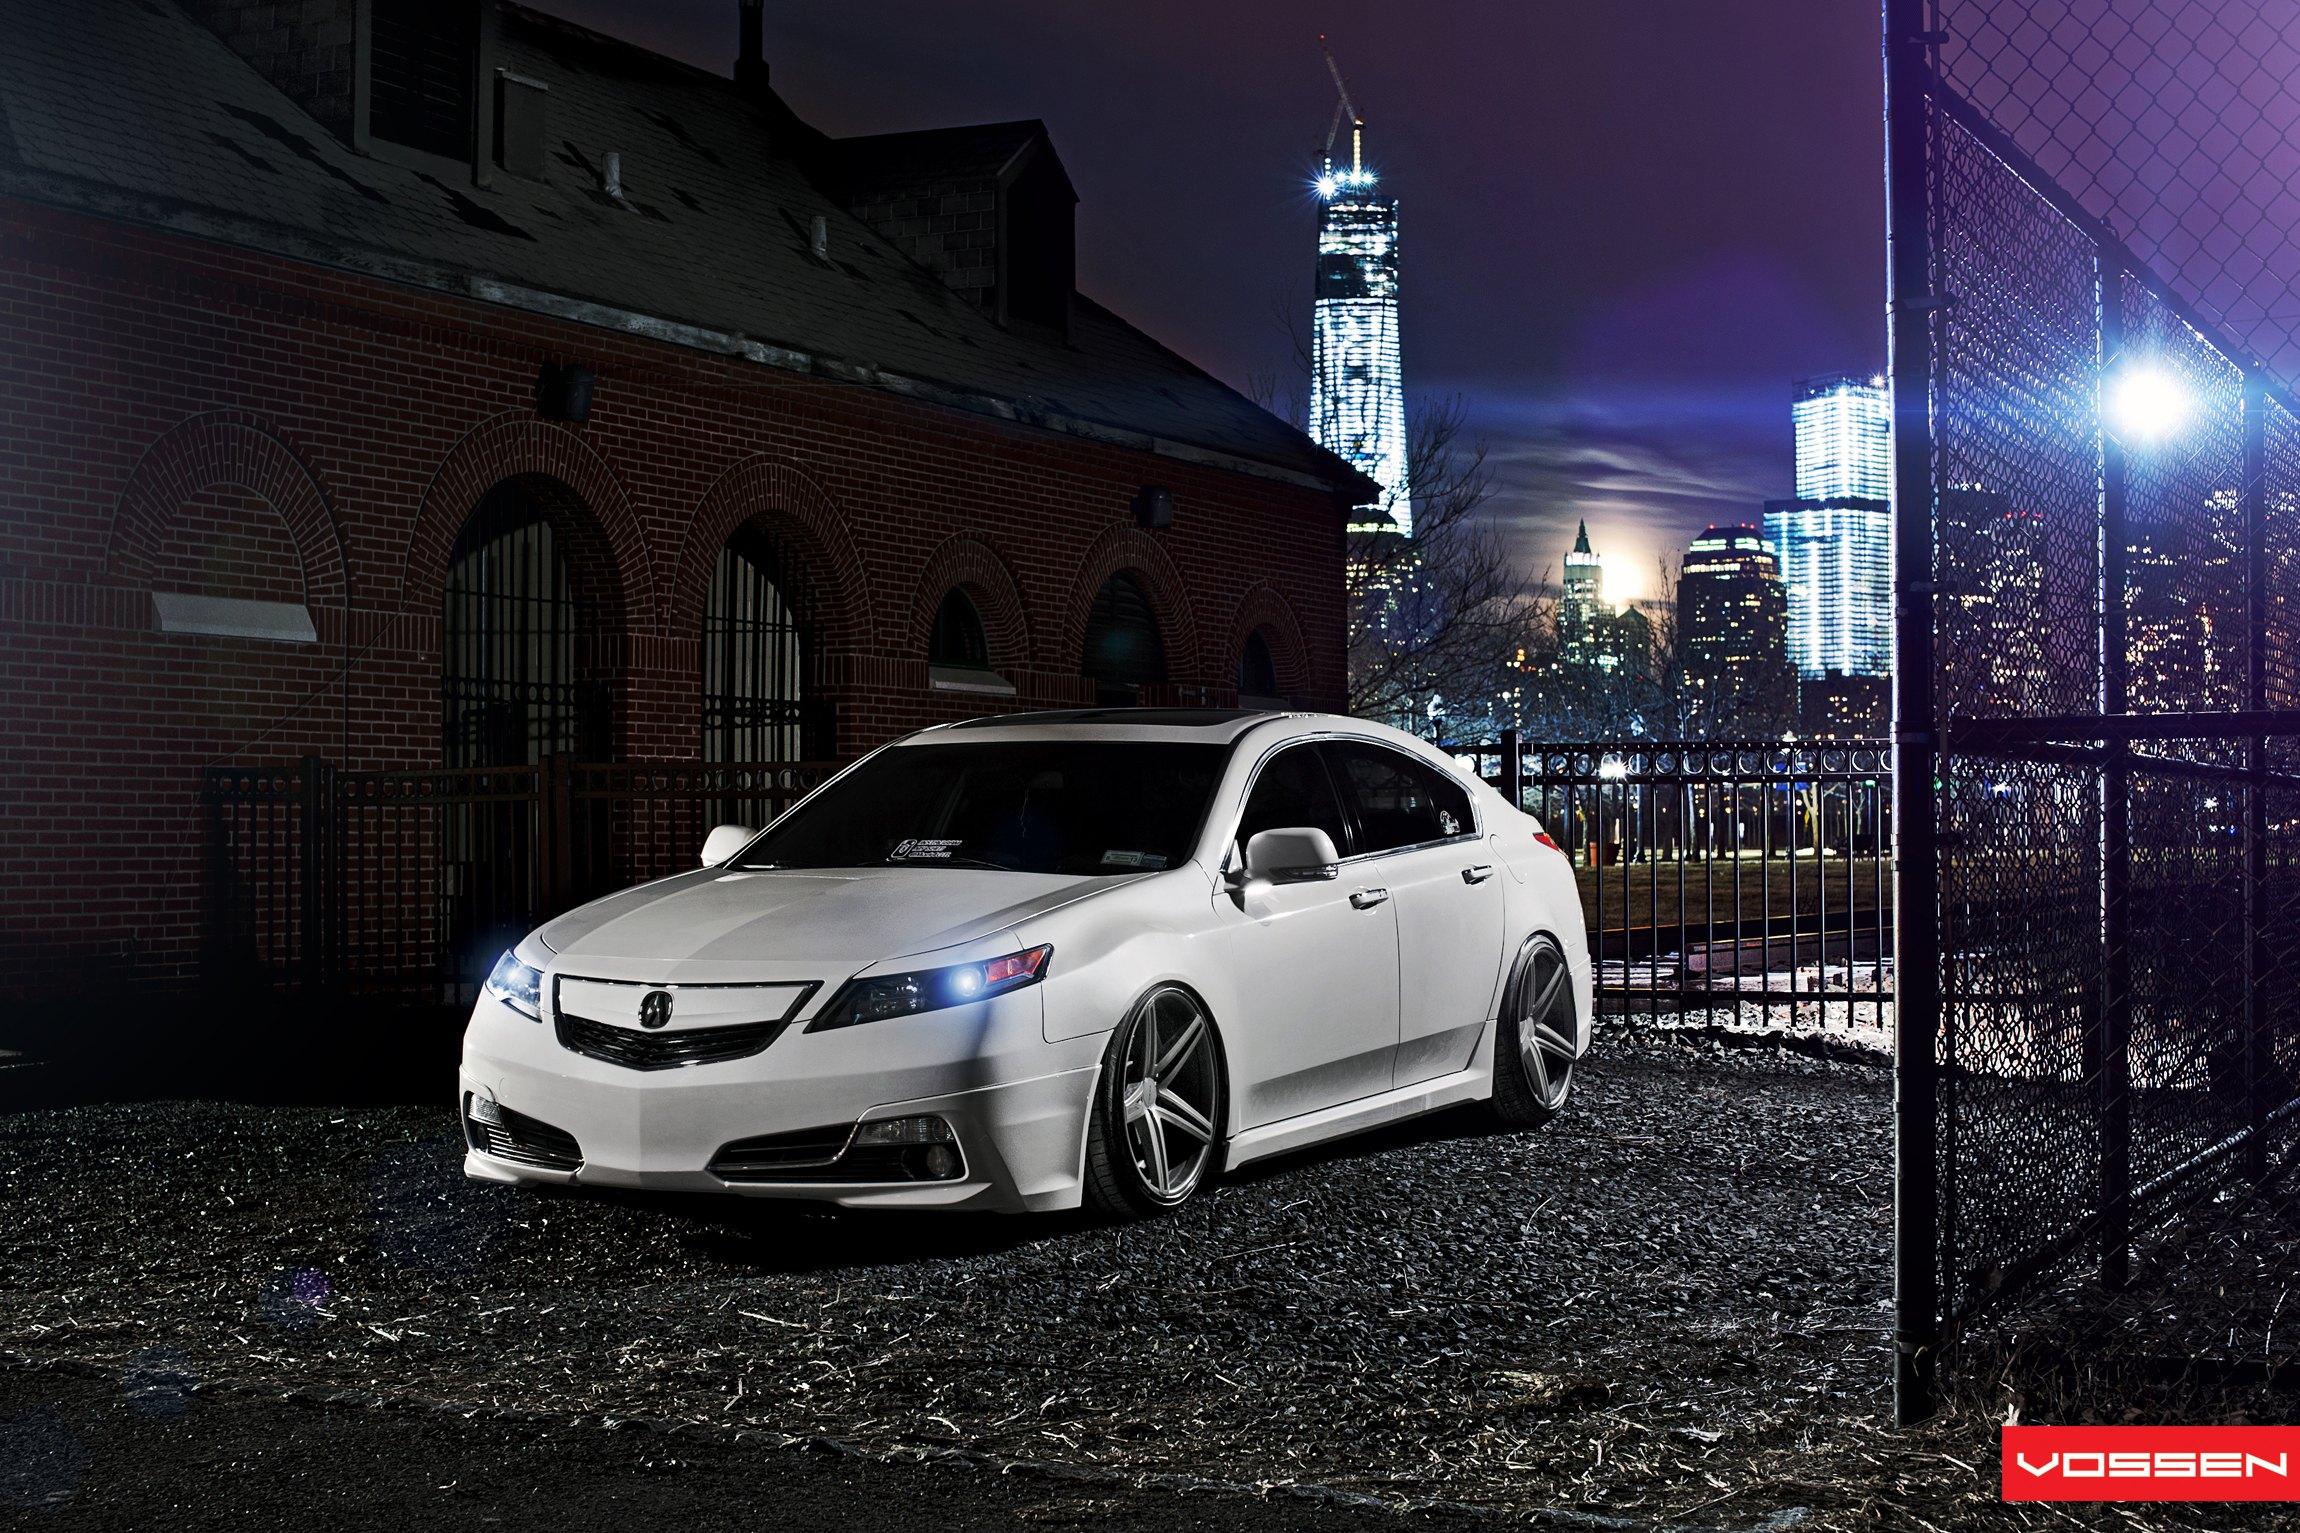 Custom Acura Tl Images Mods Photos Upgrades Carid Com Gallery